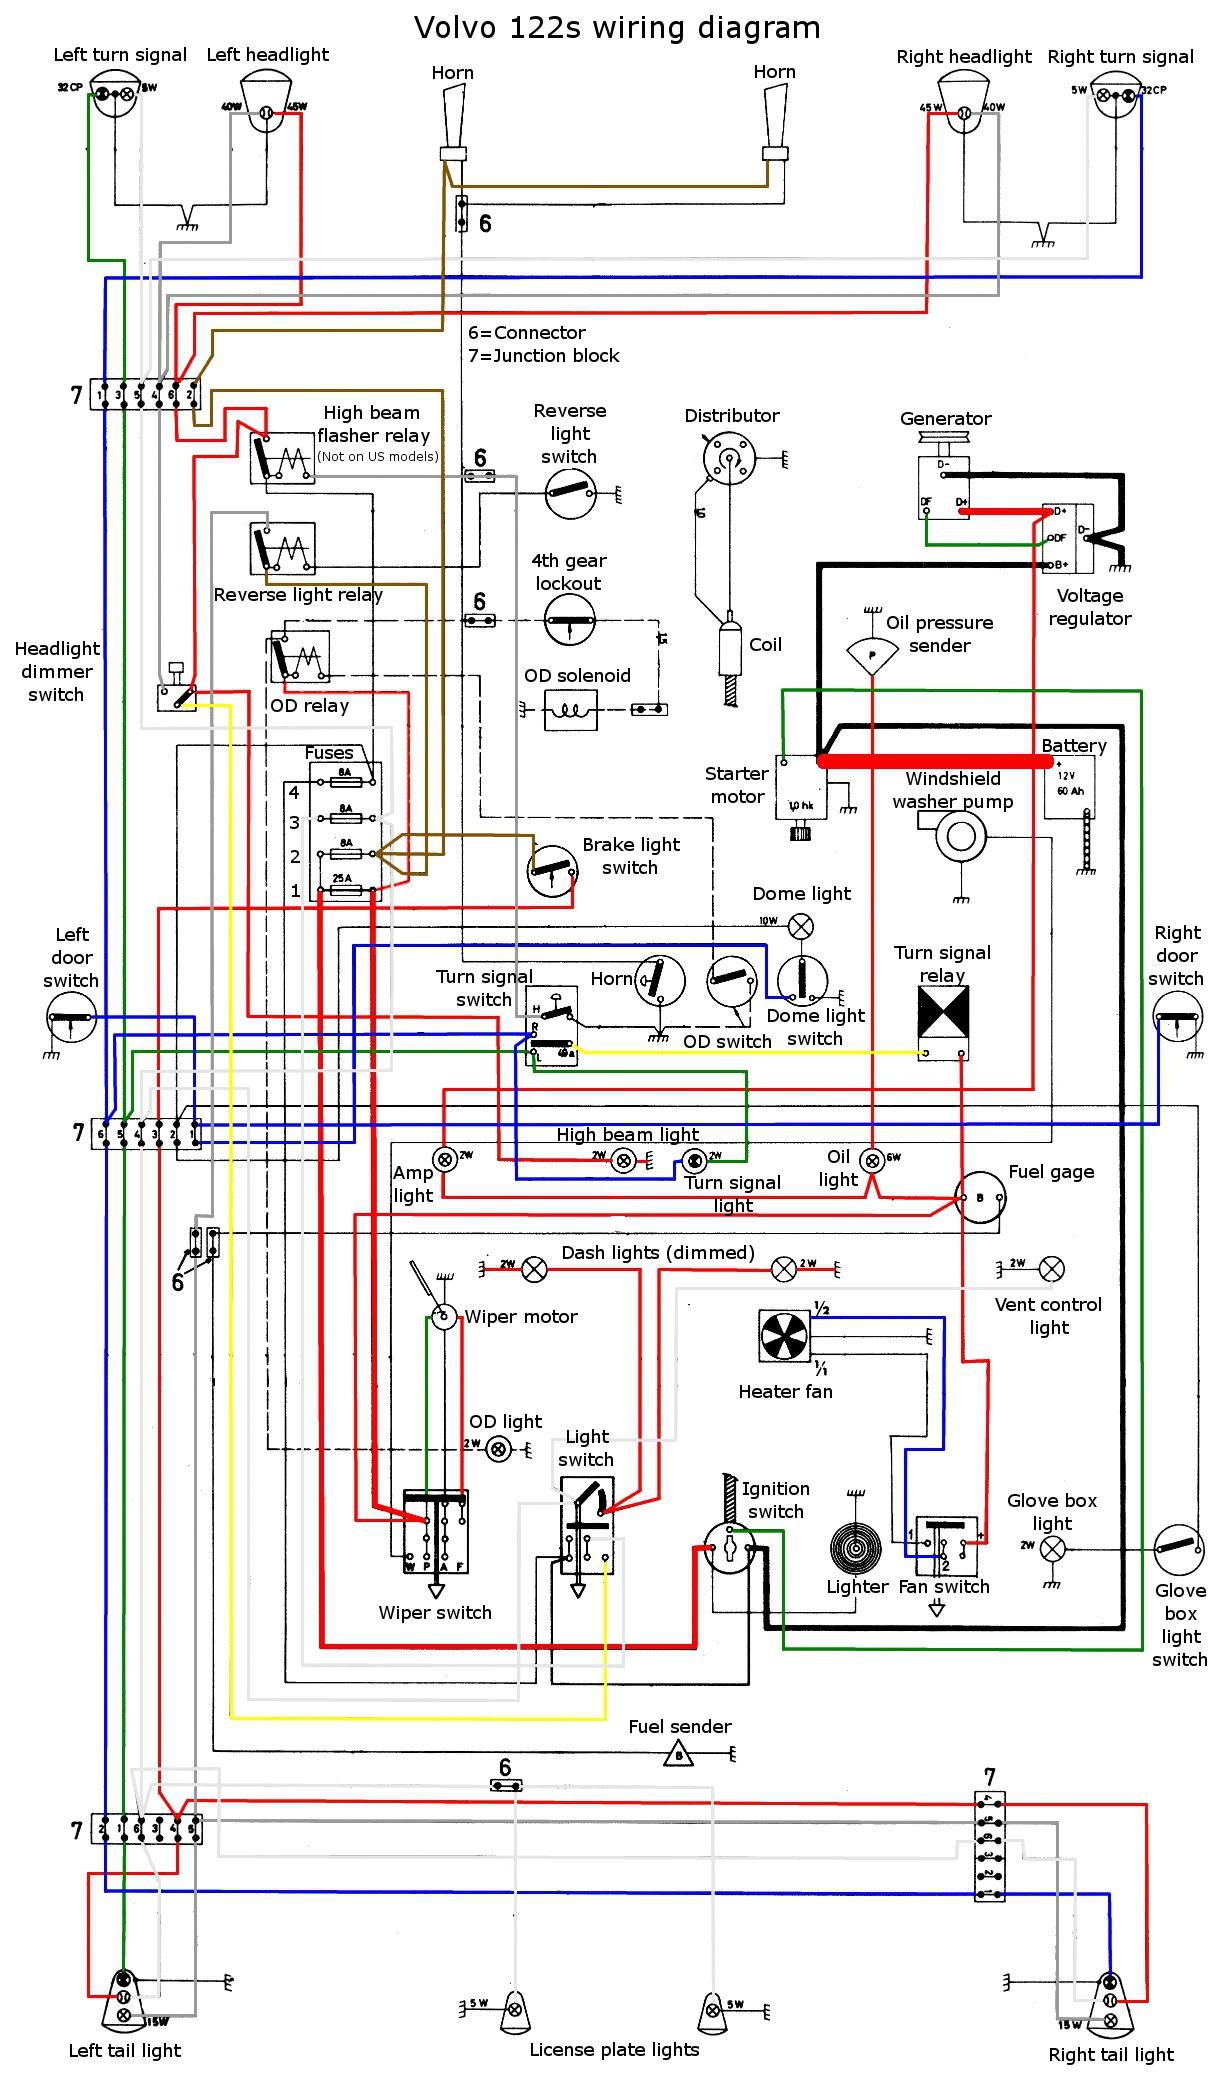 Diagram Volvo 740 Wiring Diagram 1986 Full Version Hd Quality Diagram 1986 Diagramforcek Nuovarmata It